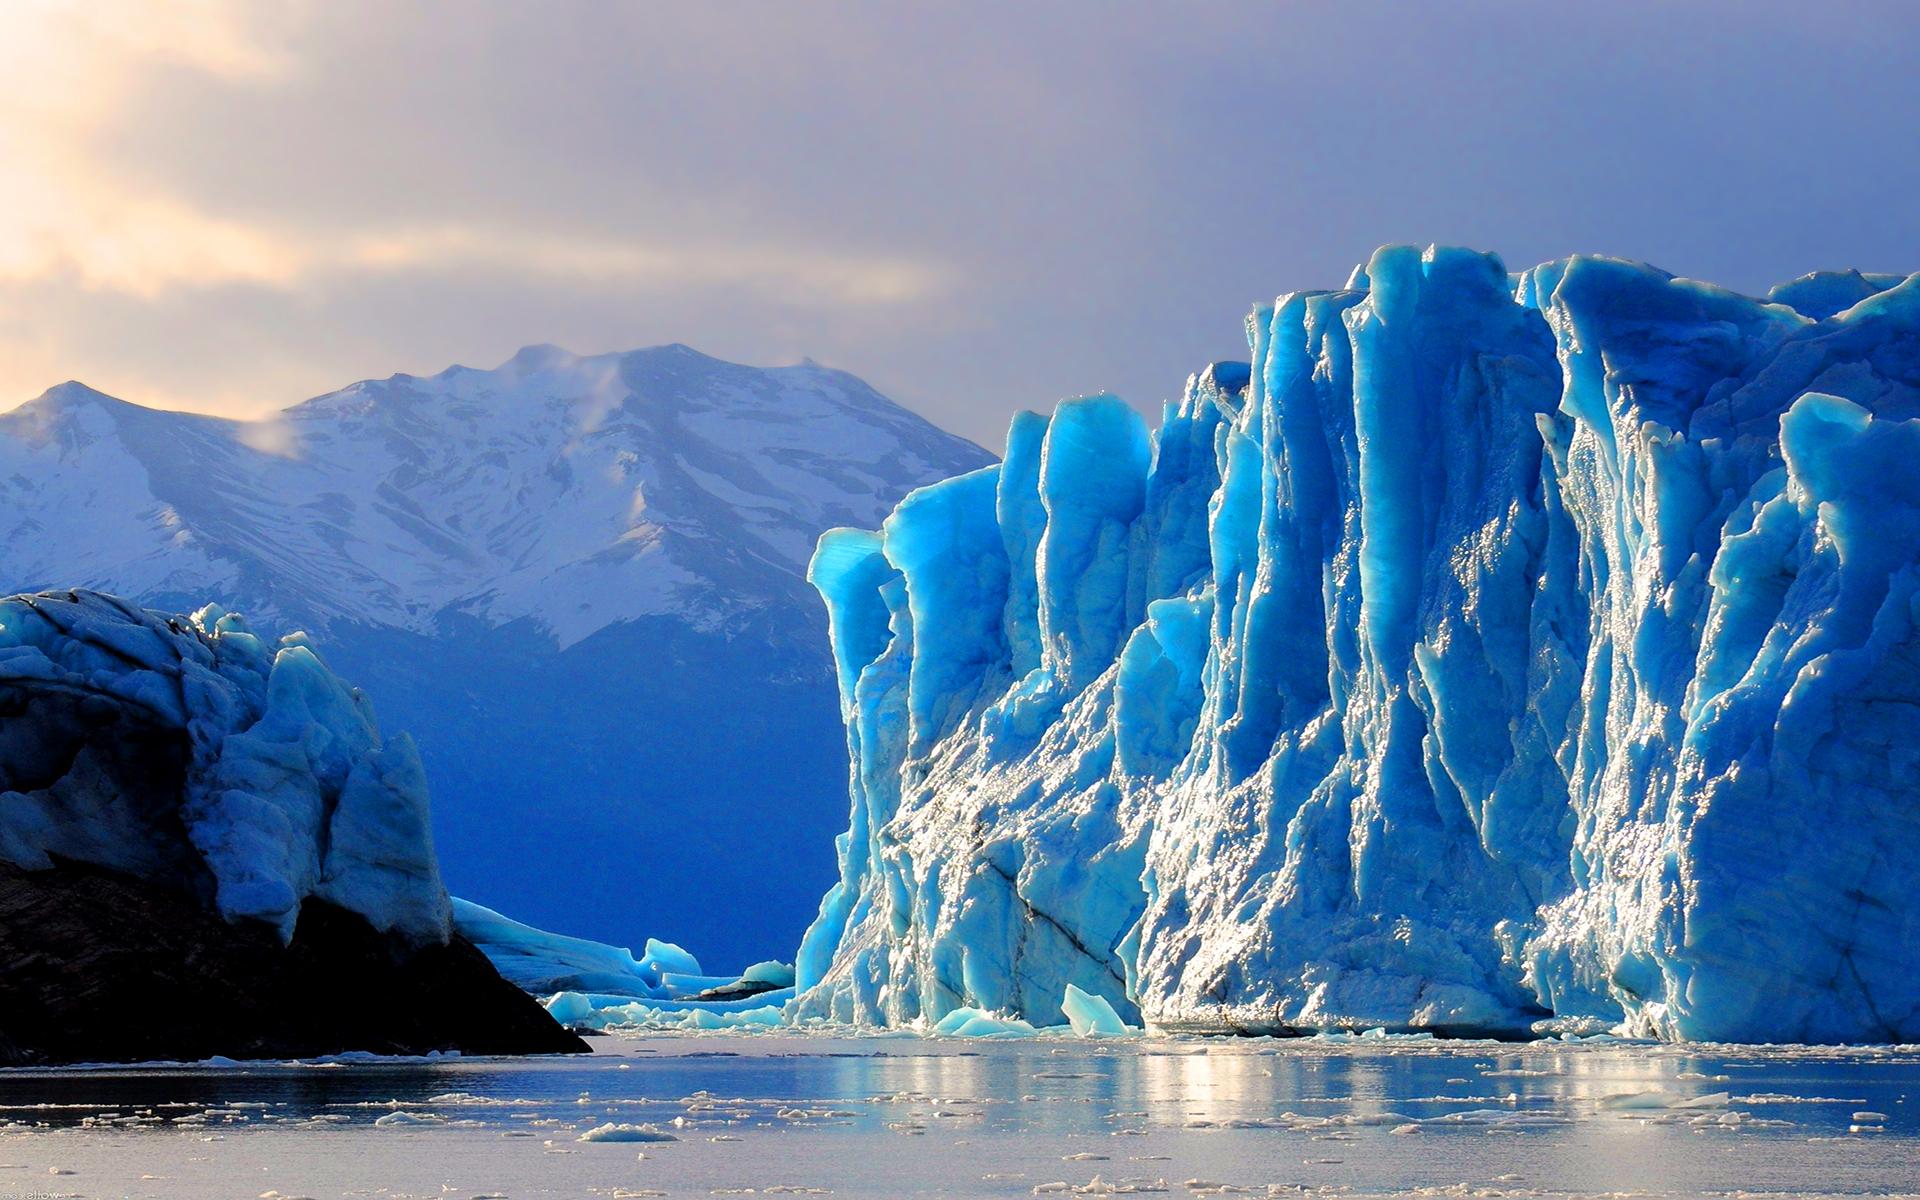 High Resolution Wallpaper | Glacier 1920x1200 px